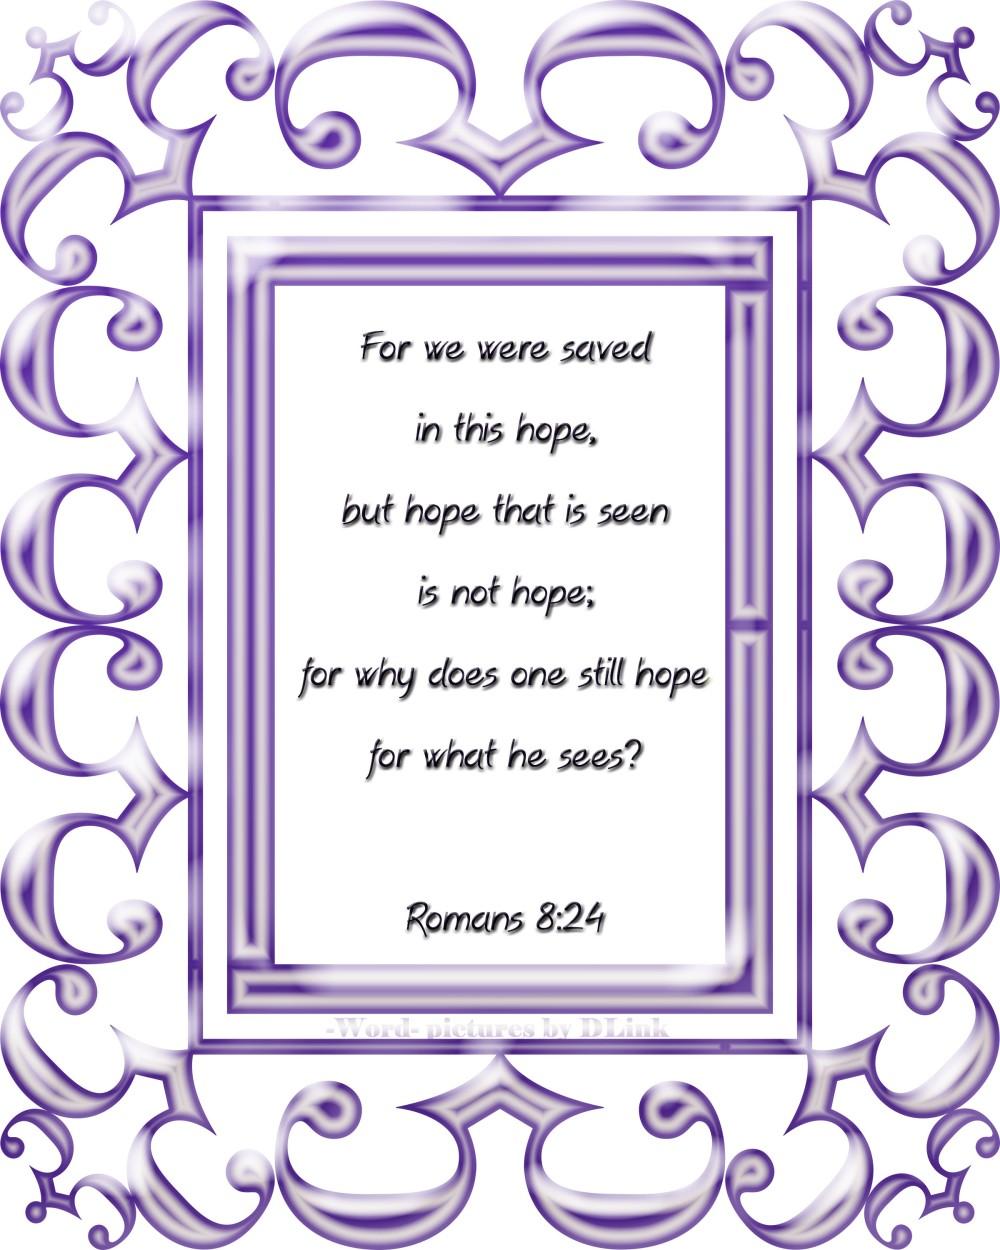 Romans 8;24